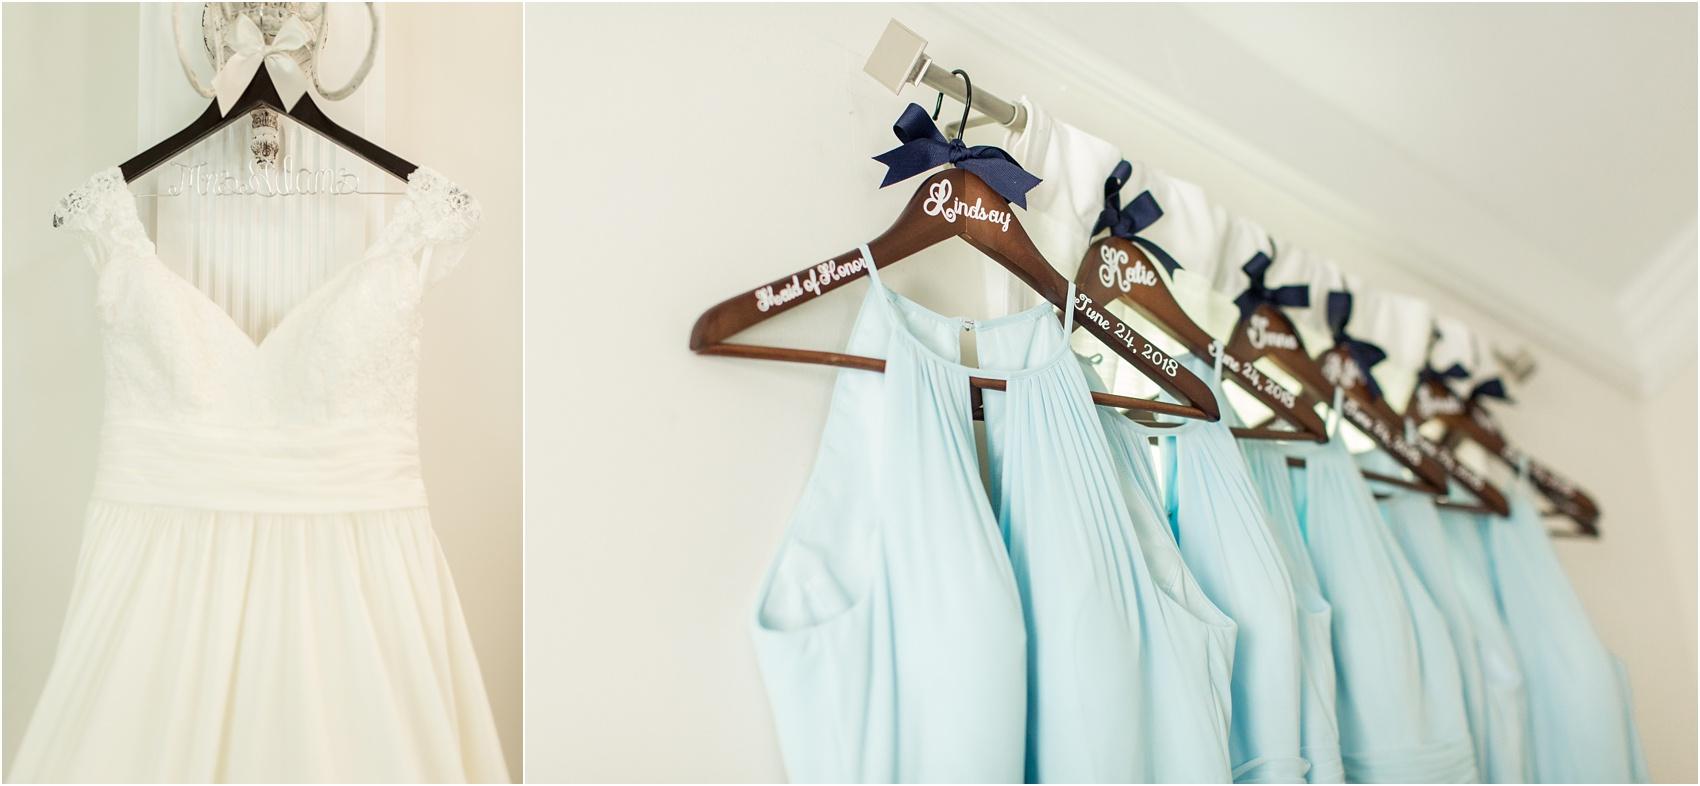 Savannah Eve Photography- Sigl-Adams Wedding- Sneak Peek-4.jpg